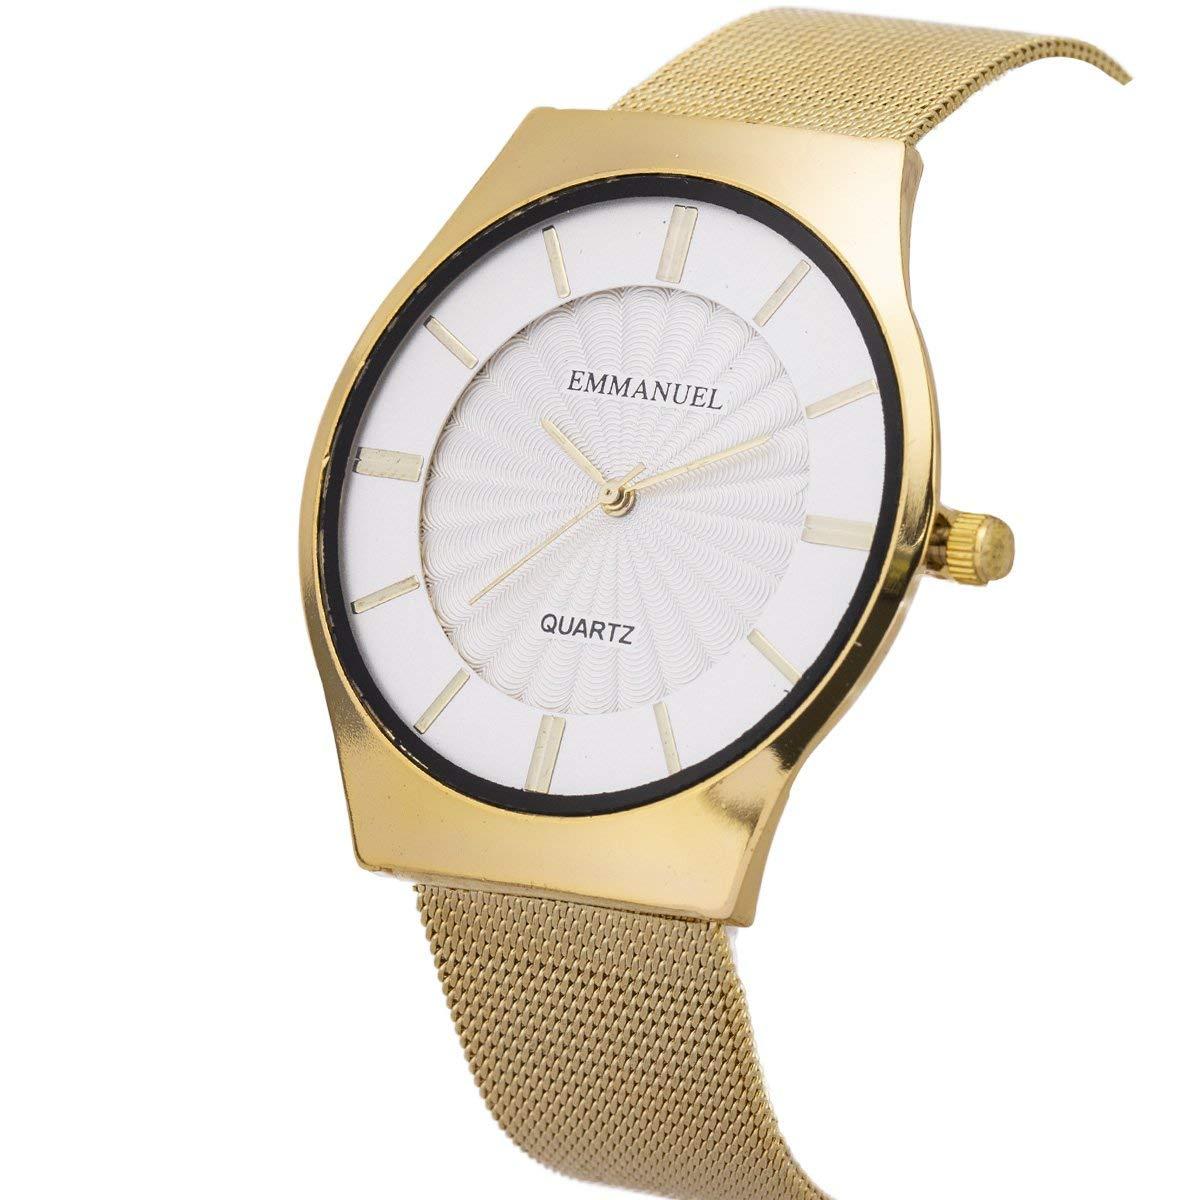 Wrist Watch Men Ultra-Thin Minimalist Mesh Stainless Steel Band SIBOSUN Quartz Analog